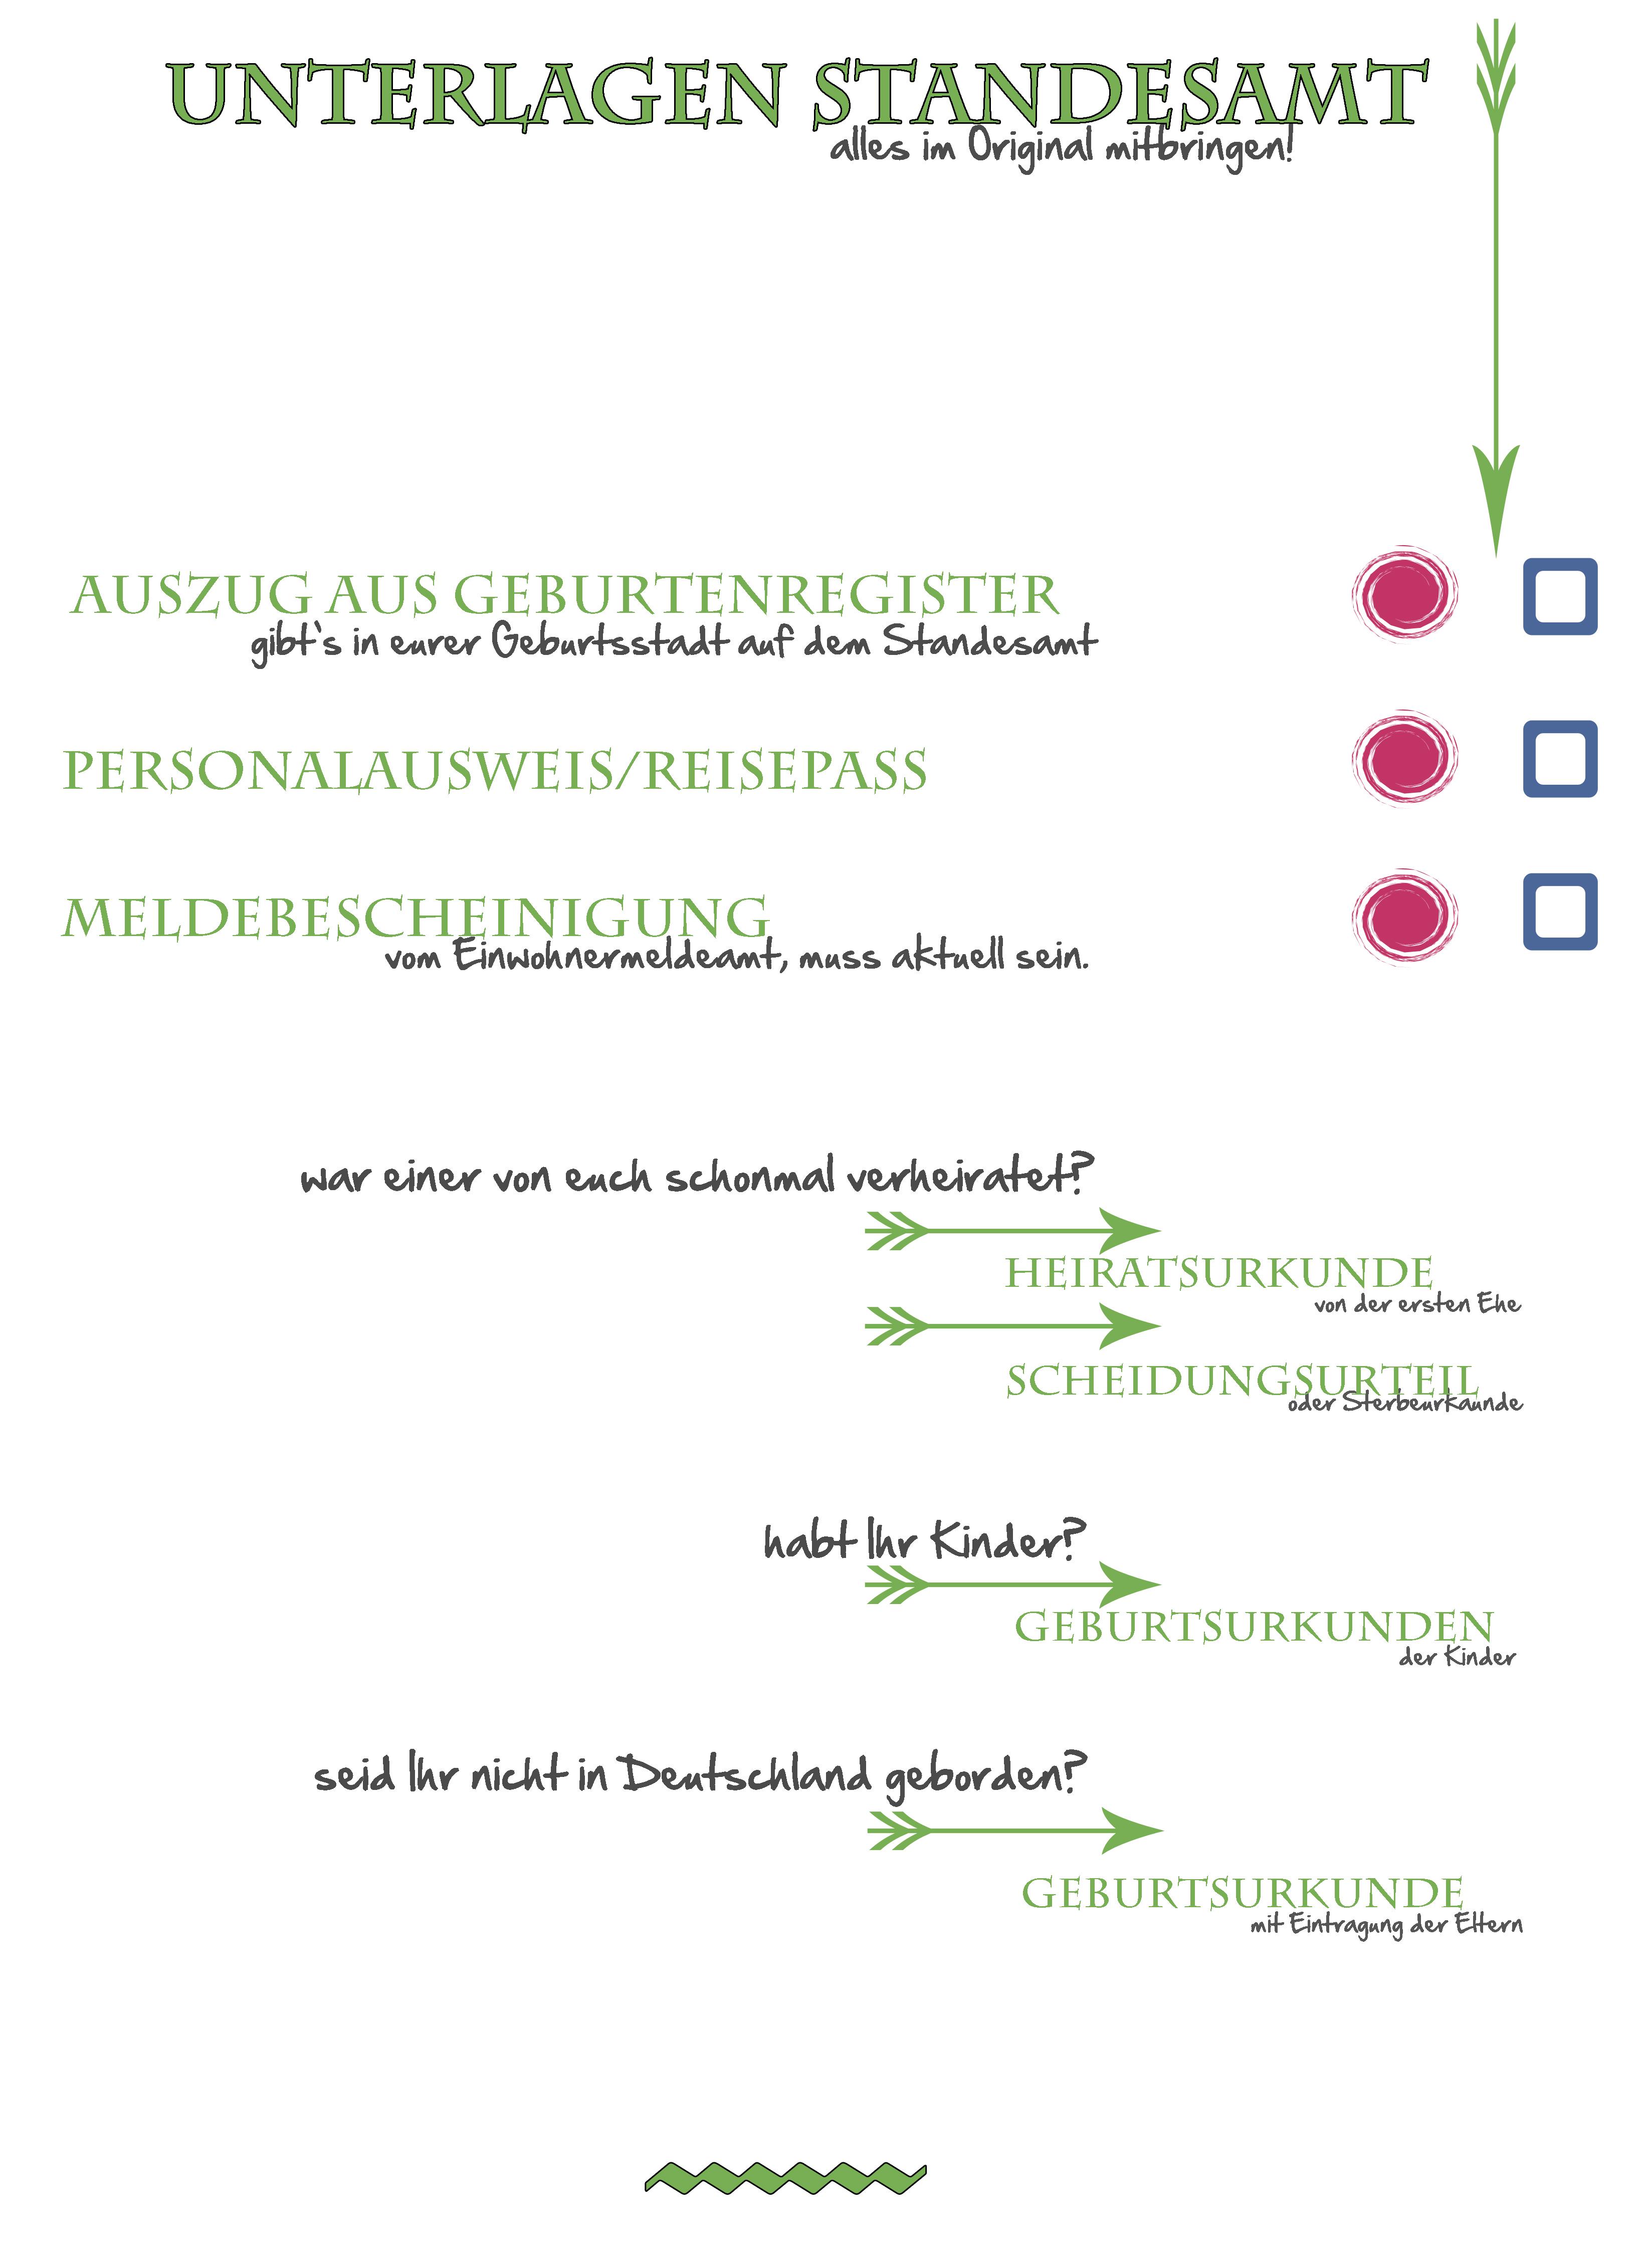 einhochzeitsblog   Hochzeitsblog   ein Hochzeitsblog   Seite 4